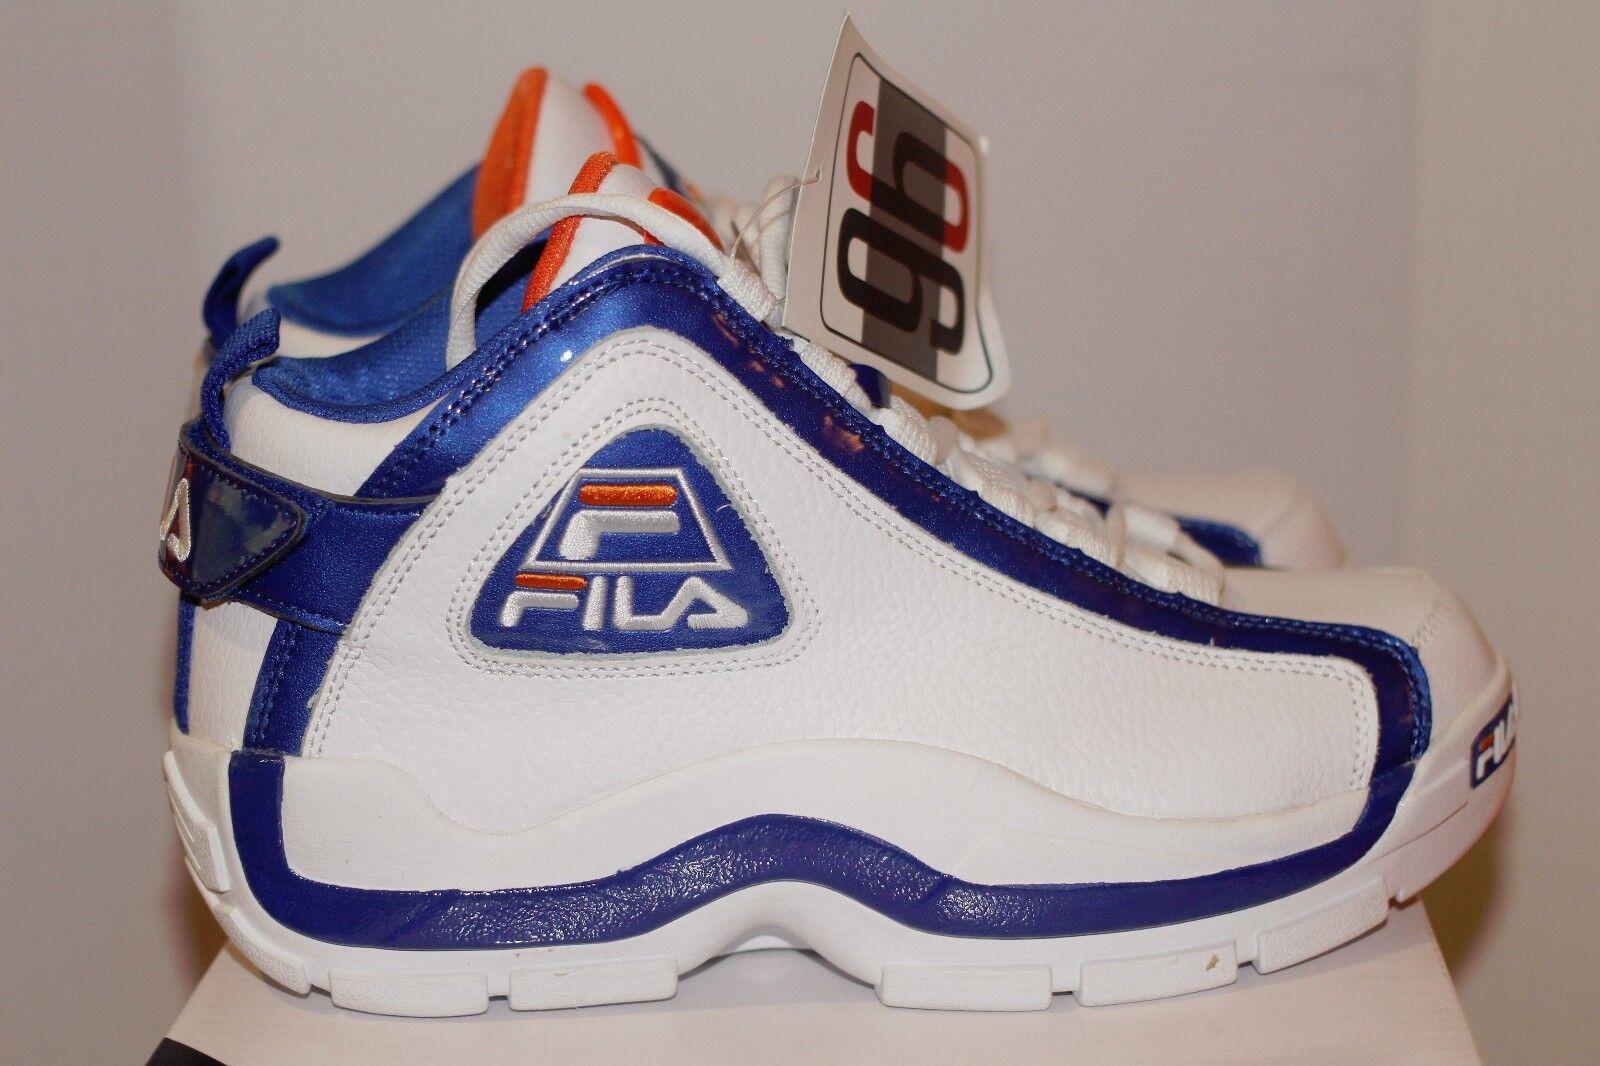 Fila 96 Grant Hill Hill Hill SZ 11 DS NY Knicks Mets Denver Broncos Gators Porzingis cbb00d